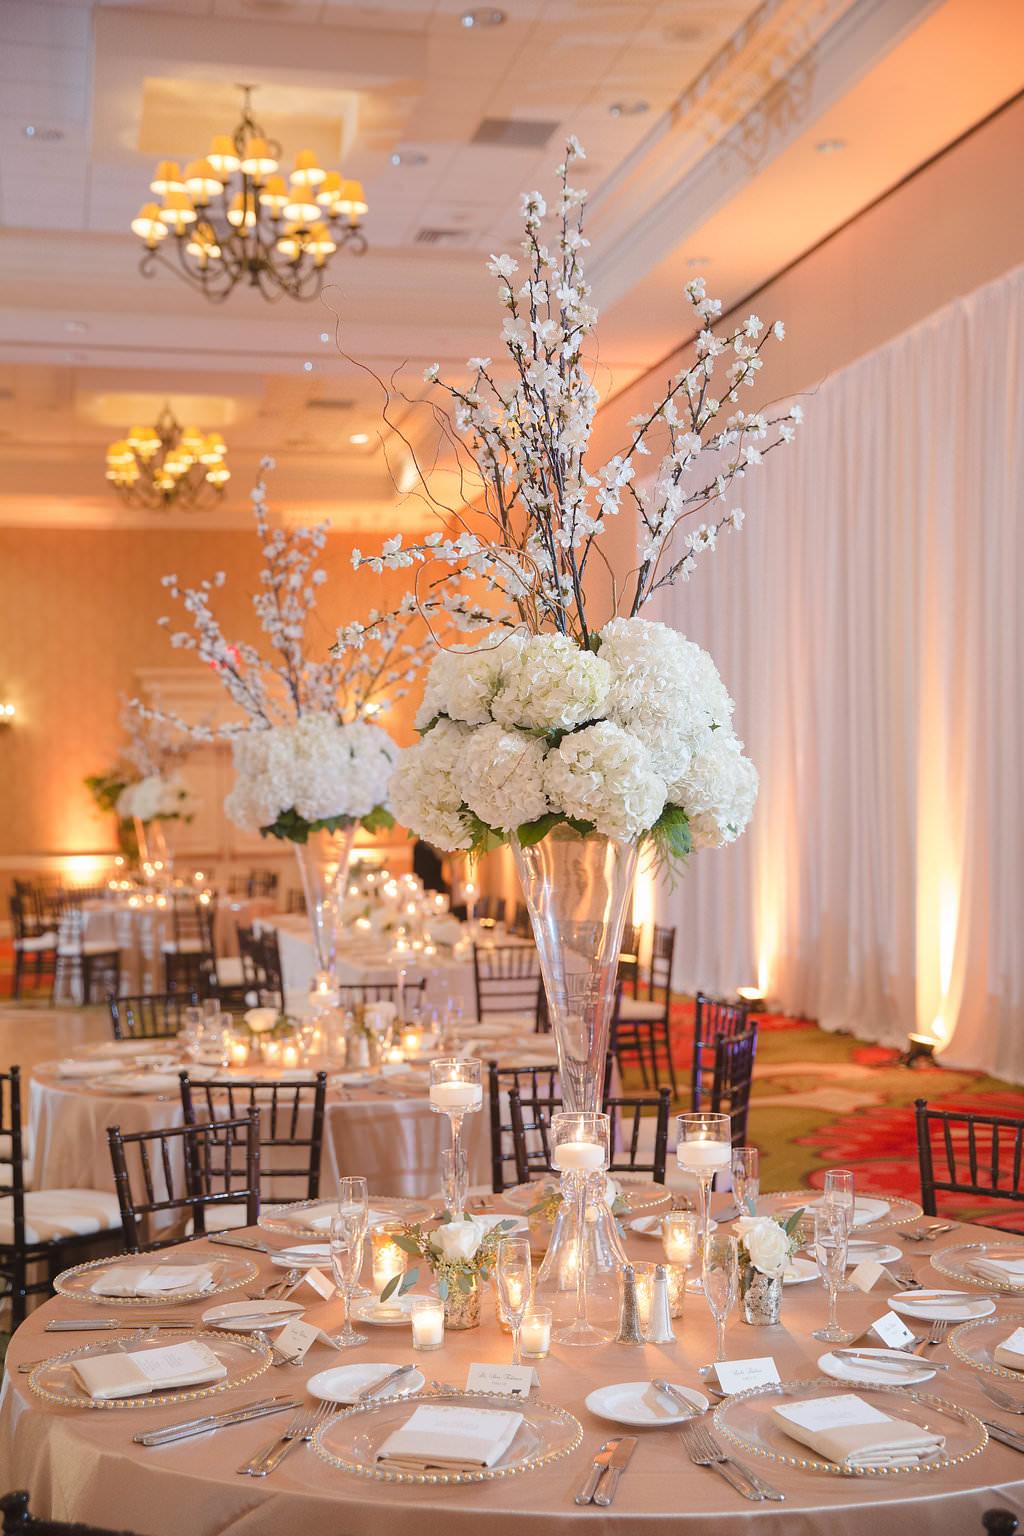 Hotel Ballroom Gold And White Wedding Reception Round Table Decor